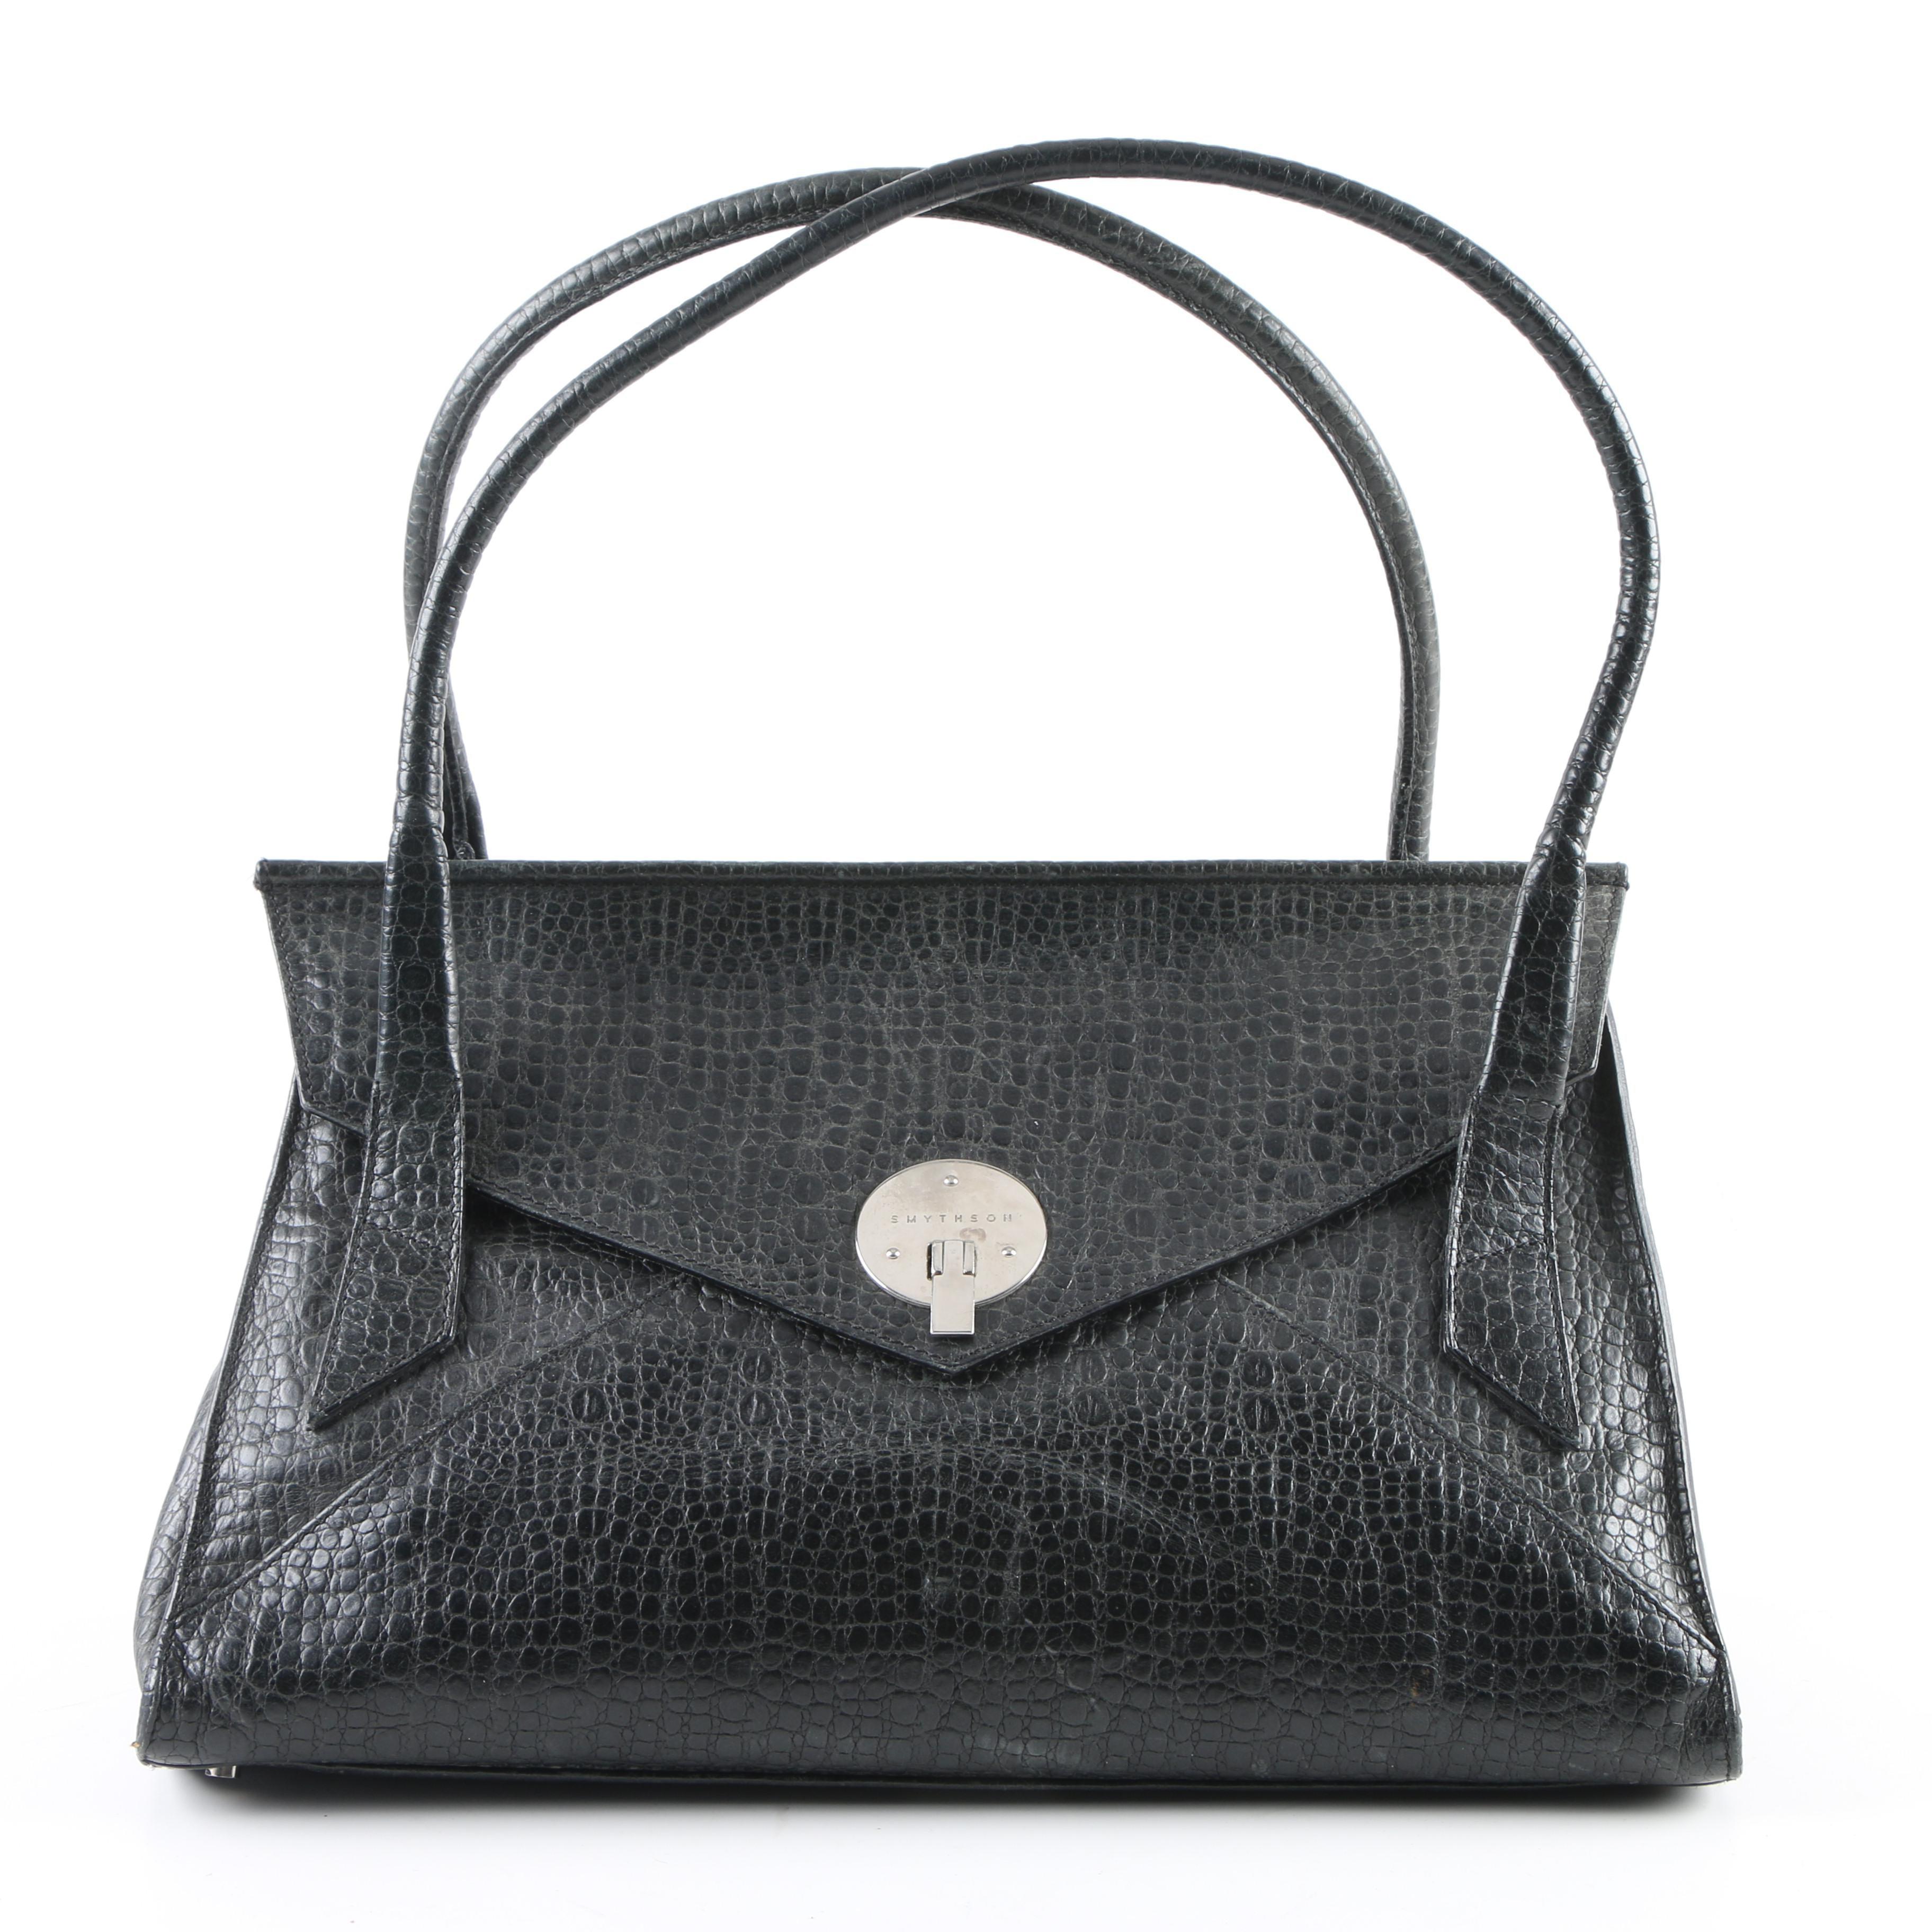 Smythson of Bond Street Black Embossed Leather Handbag